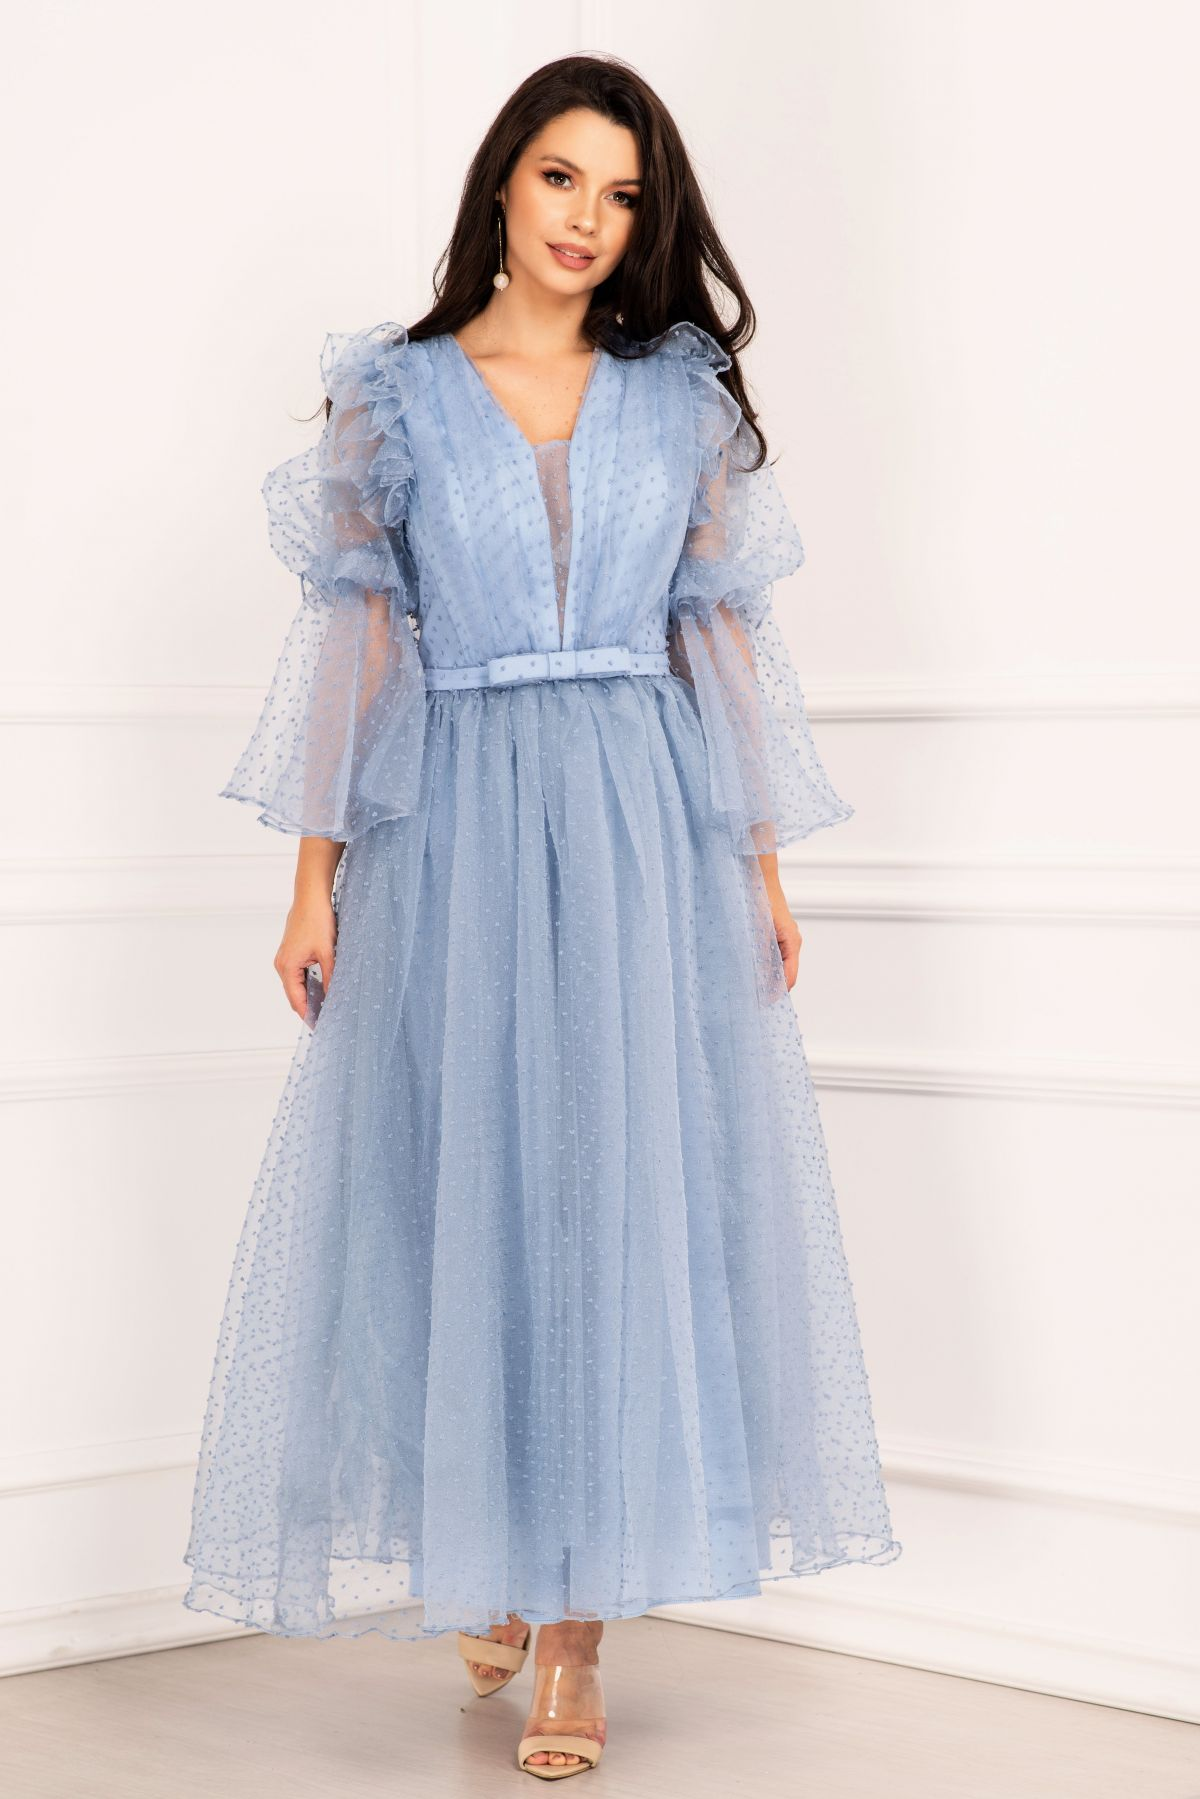 Rochie de lux bleu eleganta din tulle cu buline si volane